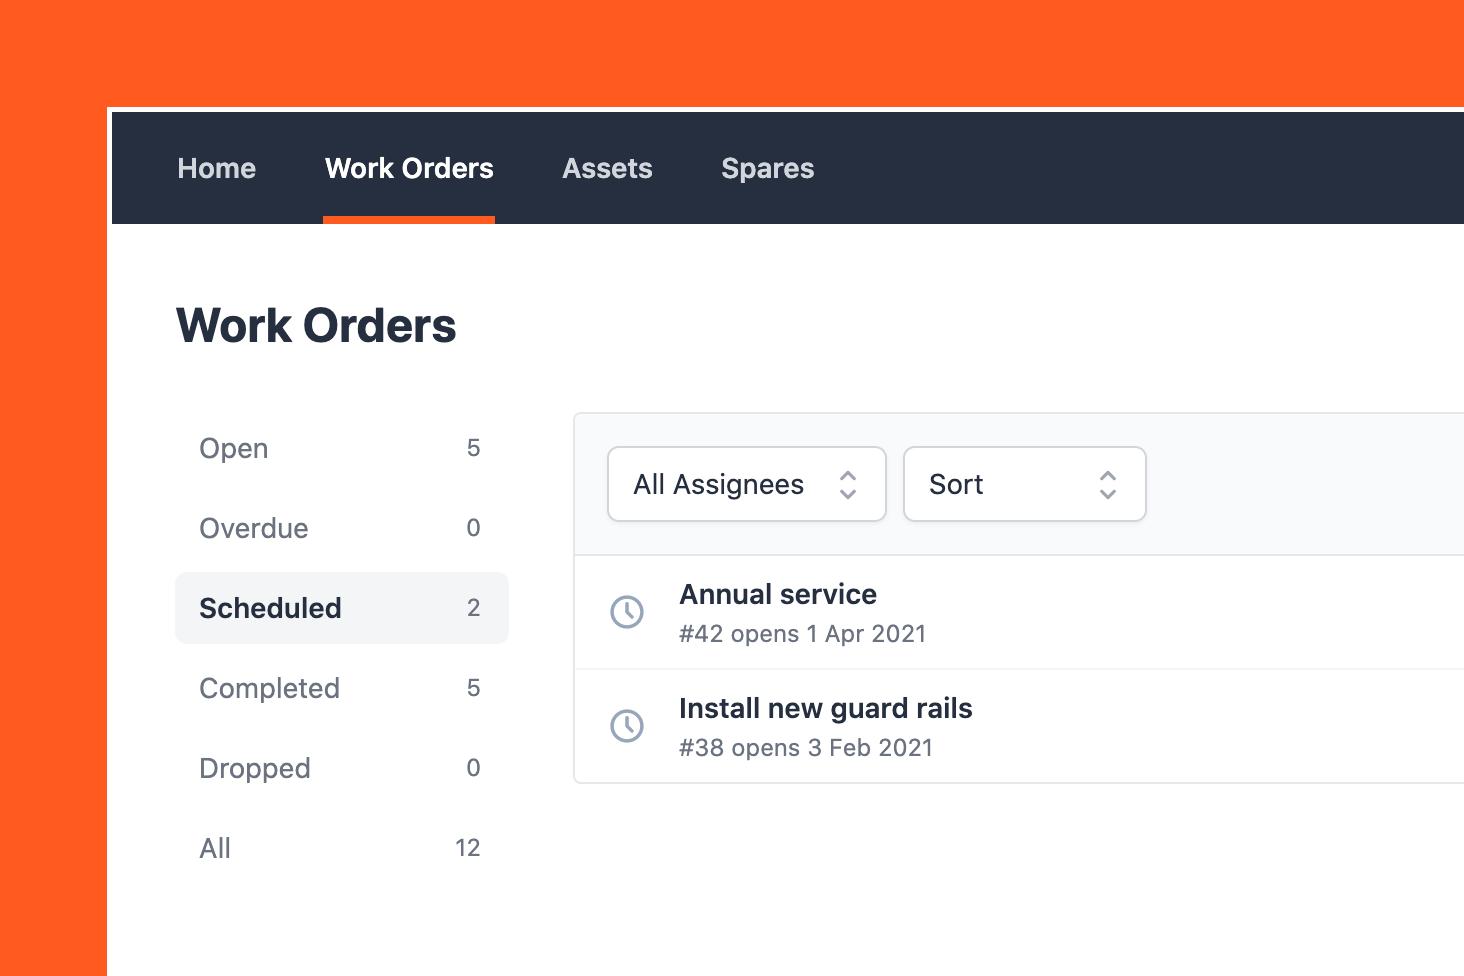 Scheduled work orders